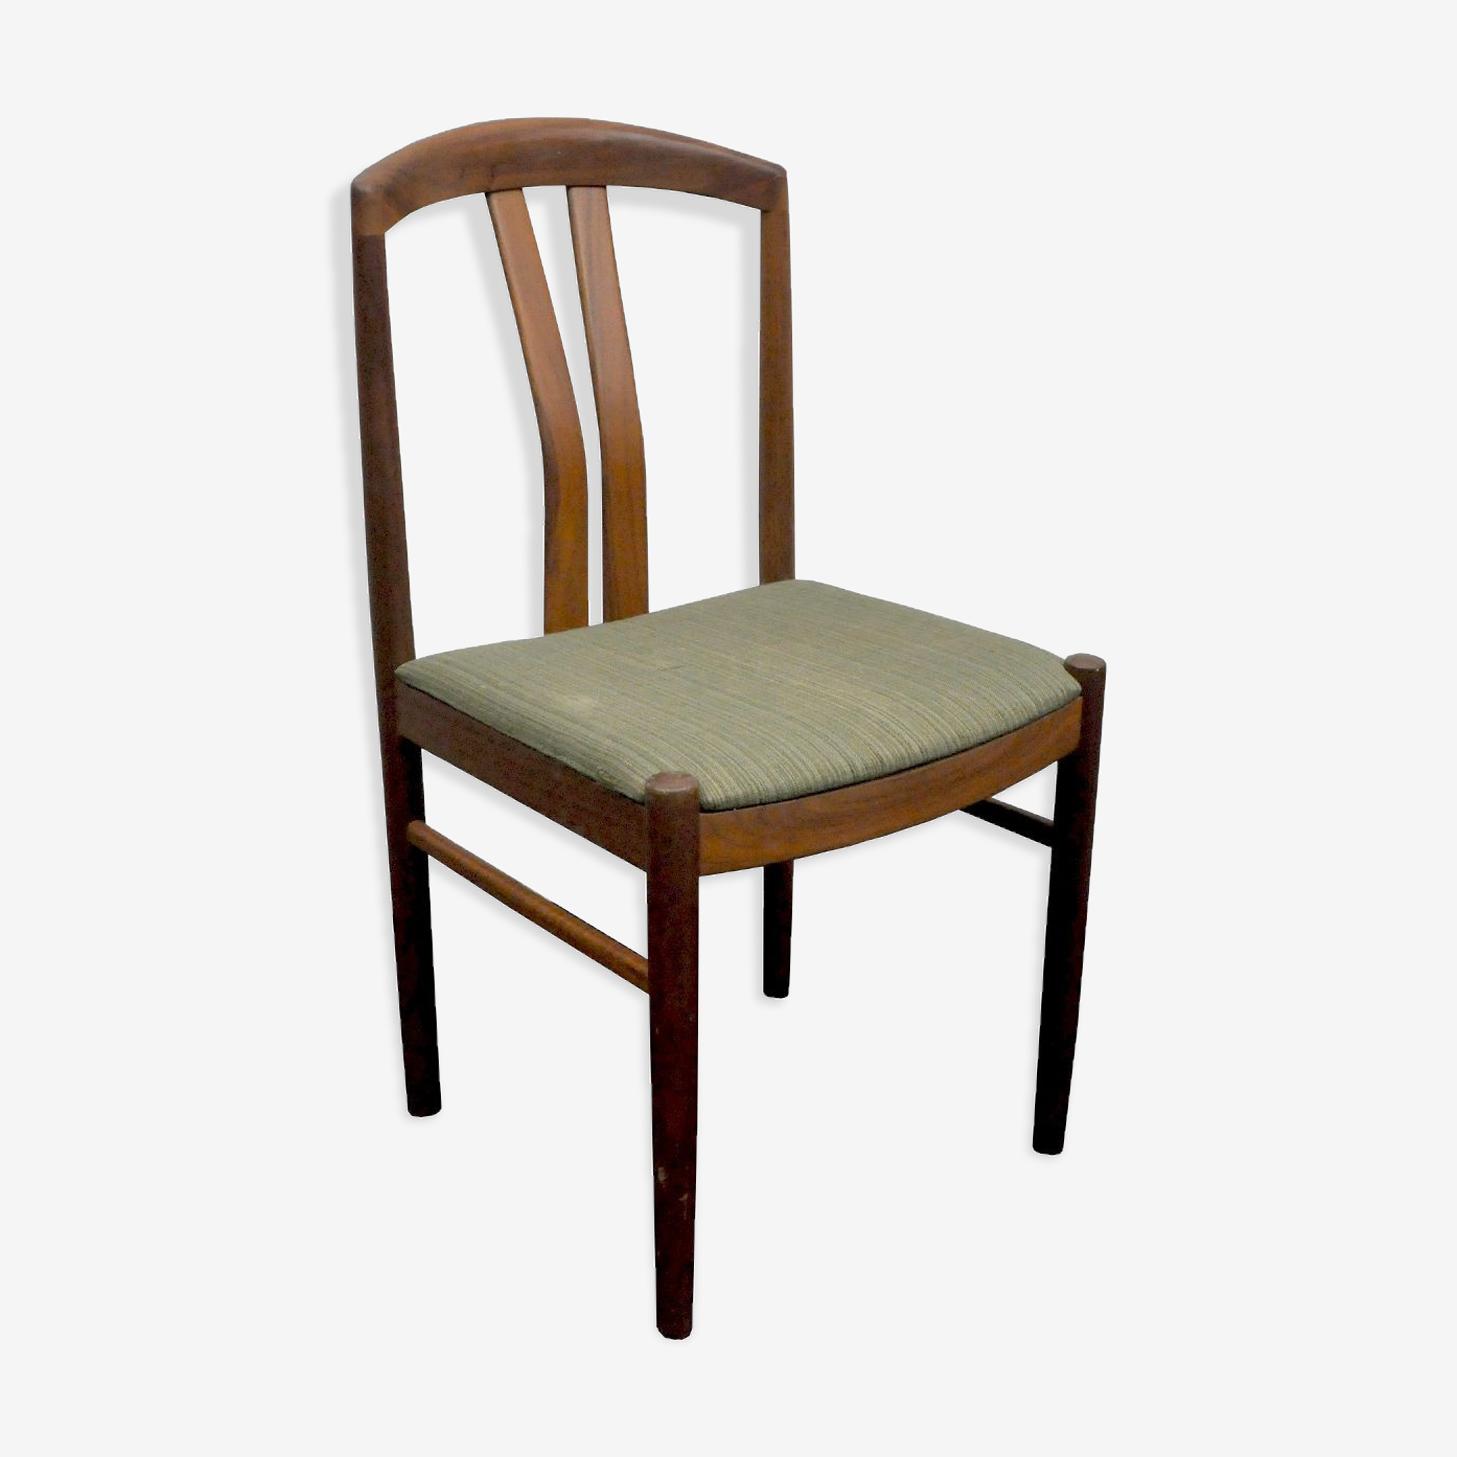 Teak chair alb. Johansson & Sons Sweden